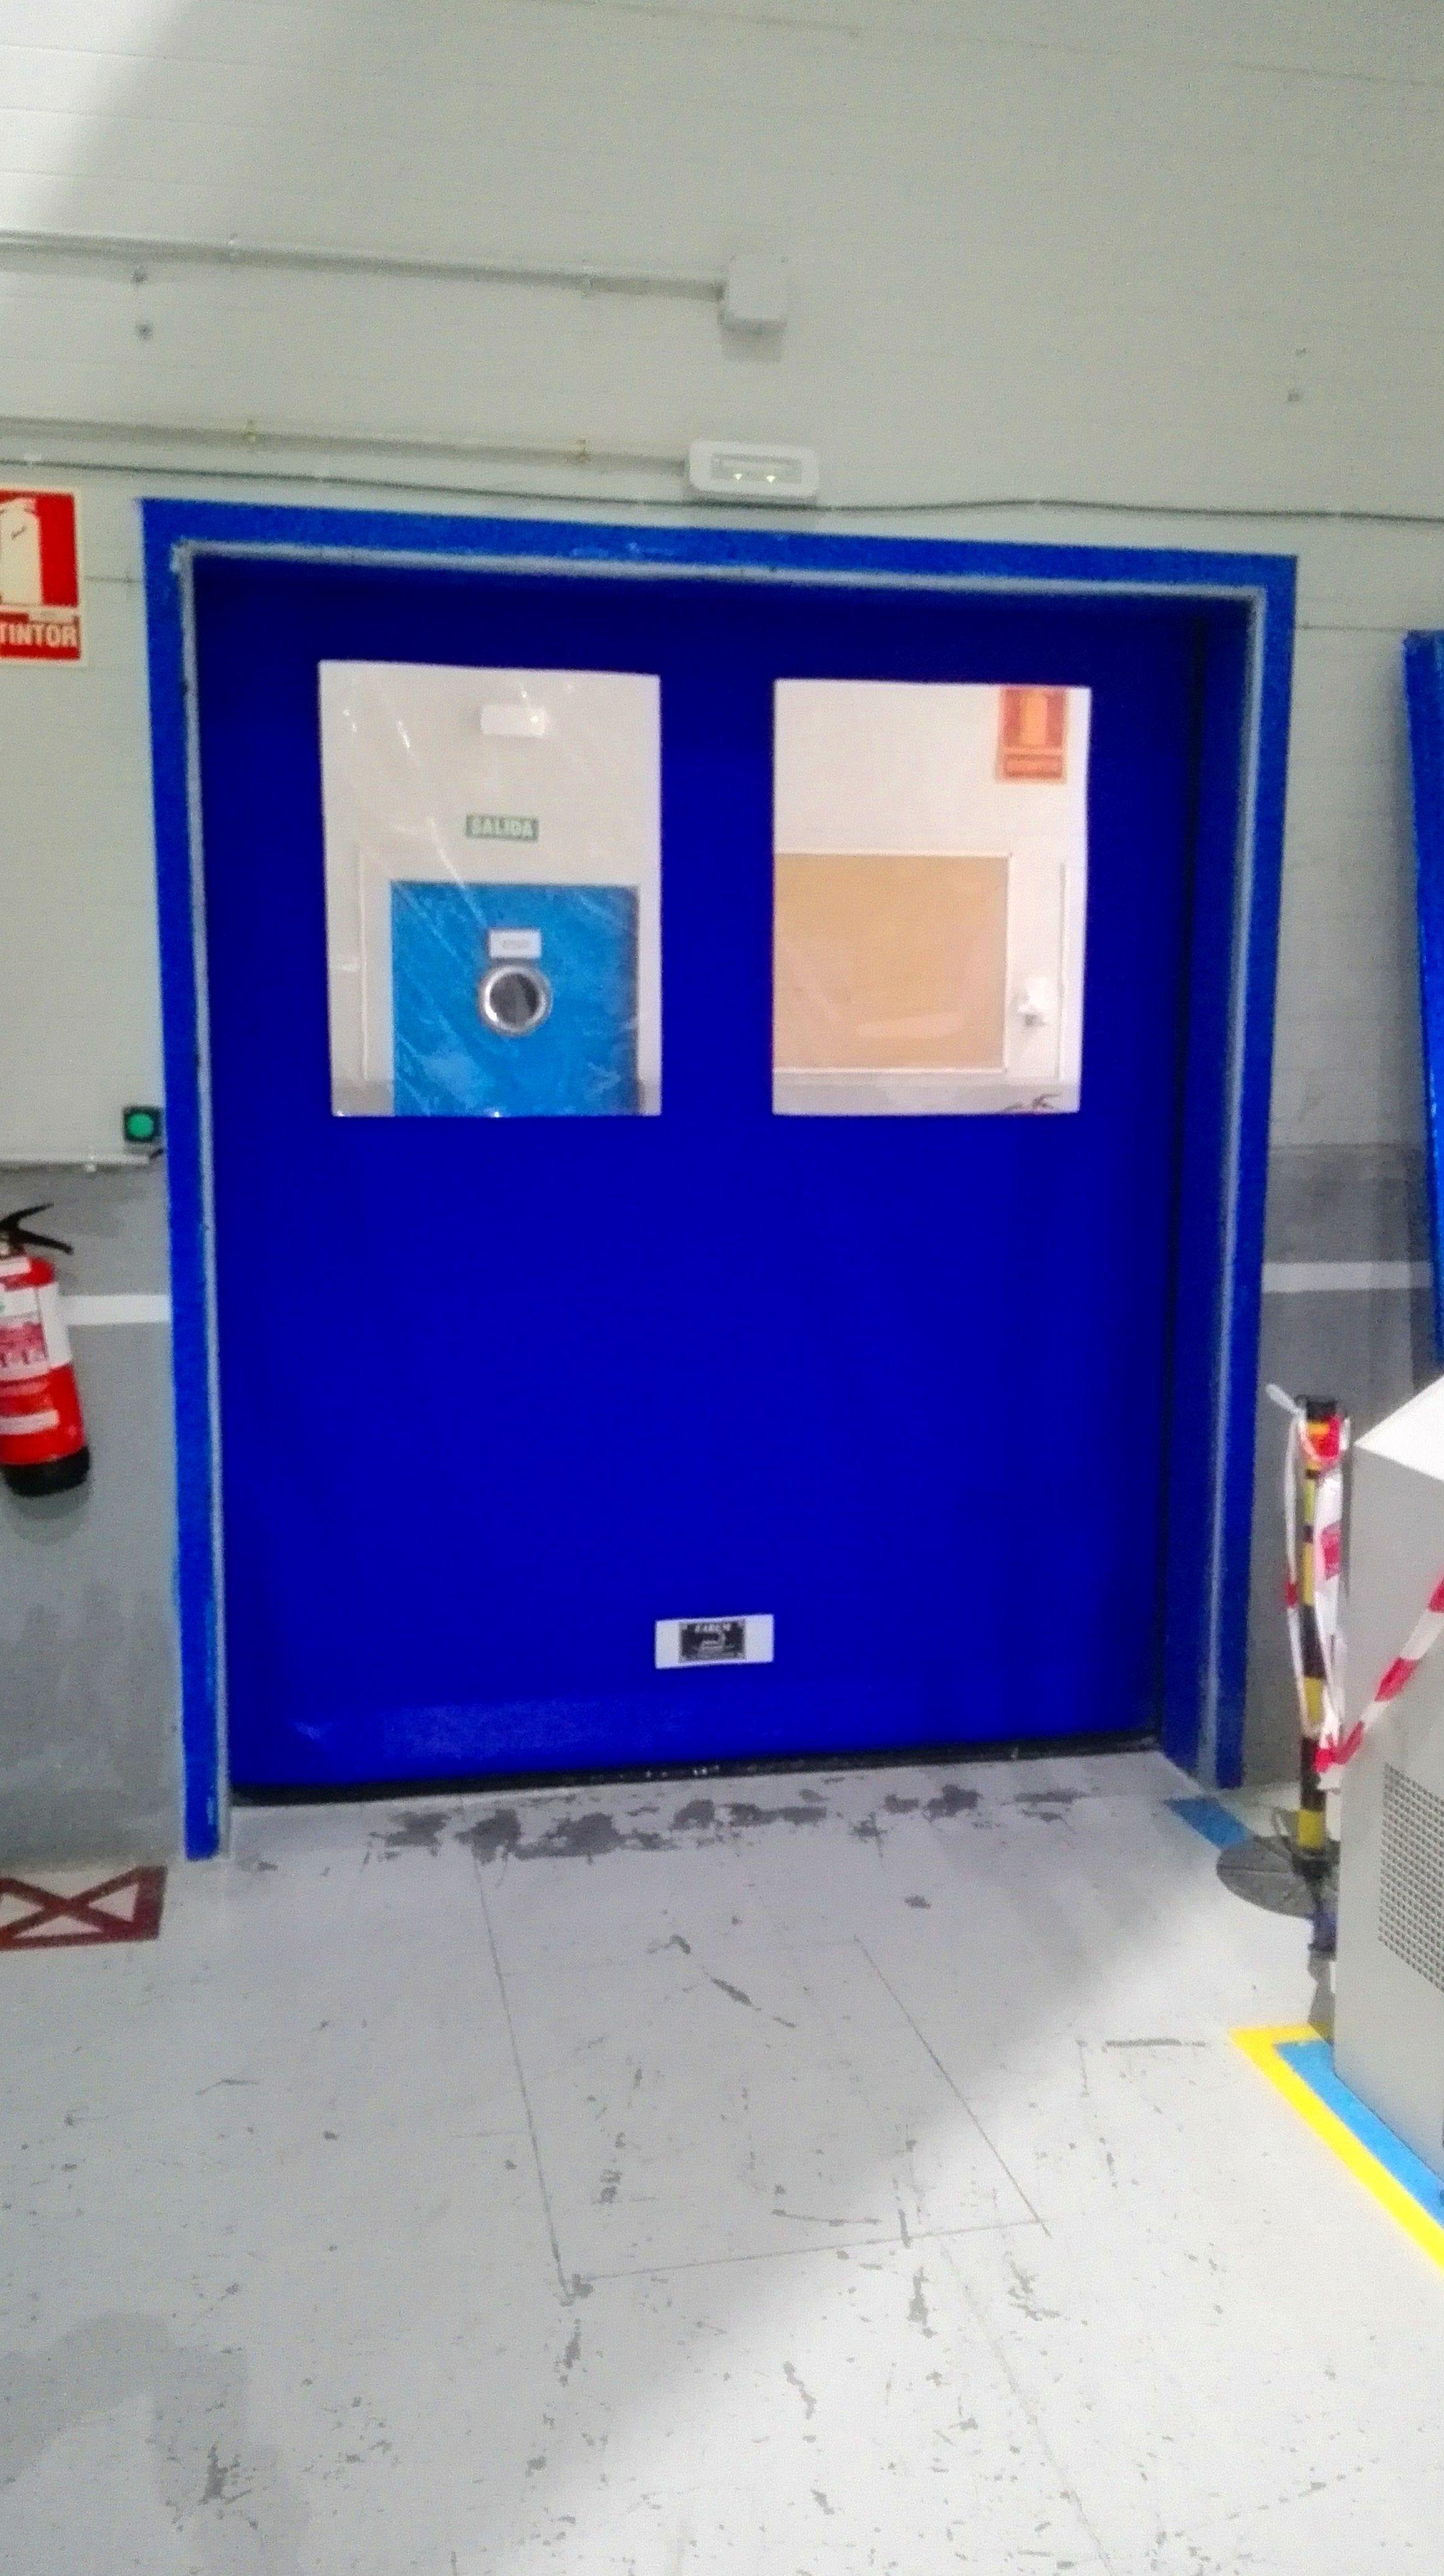 Puerta rápida enrollable autofull autorreparable Faremgies lazos apertura magnéticos